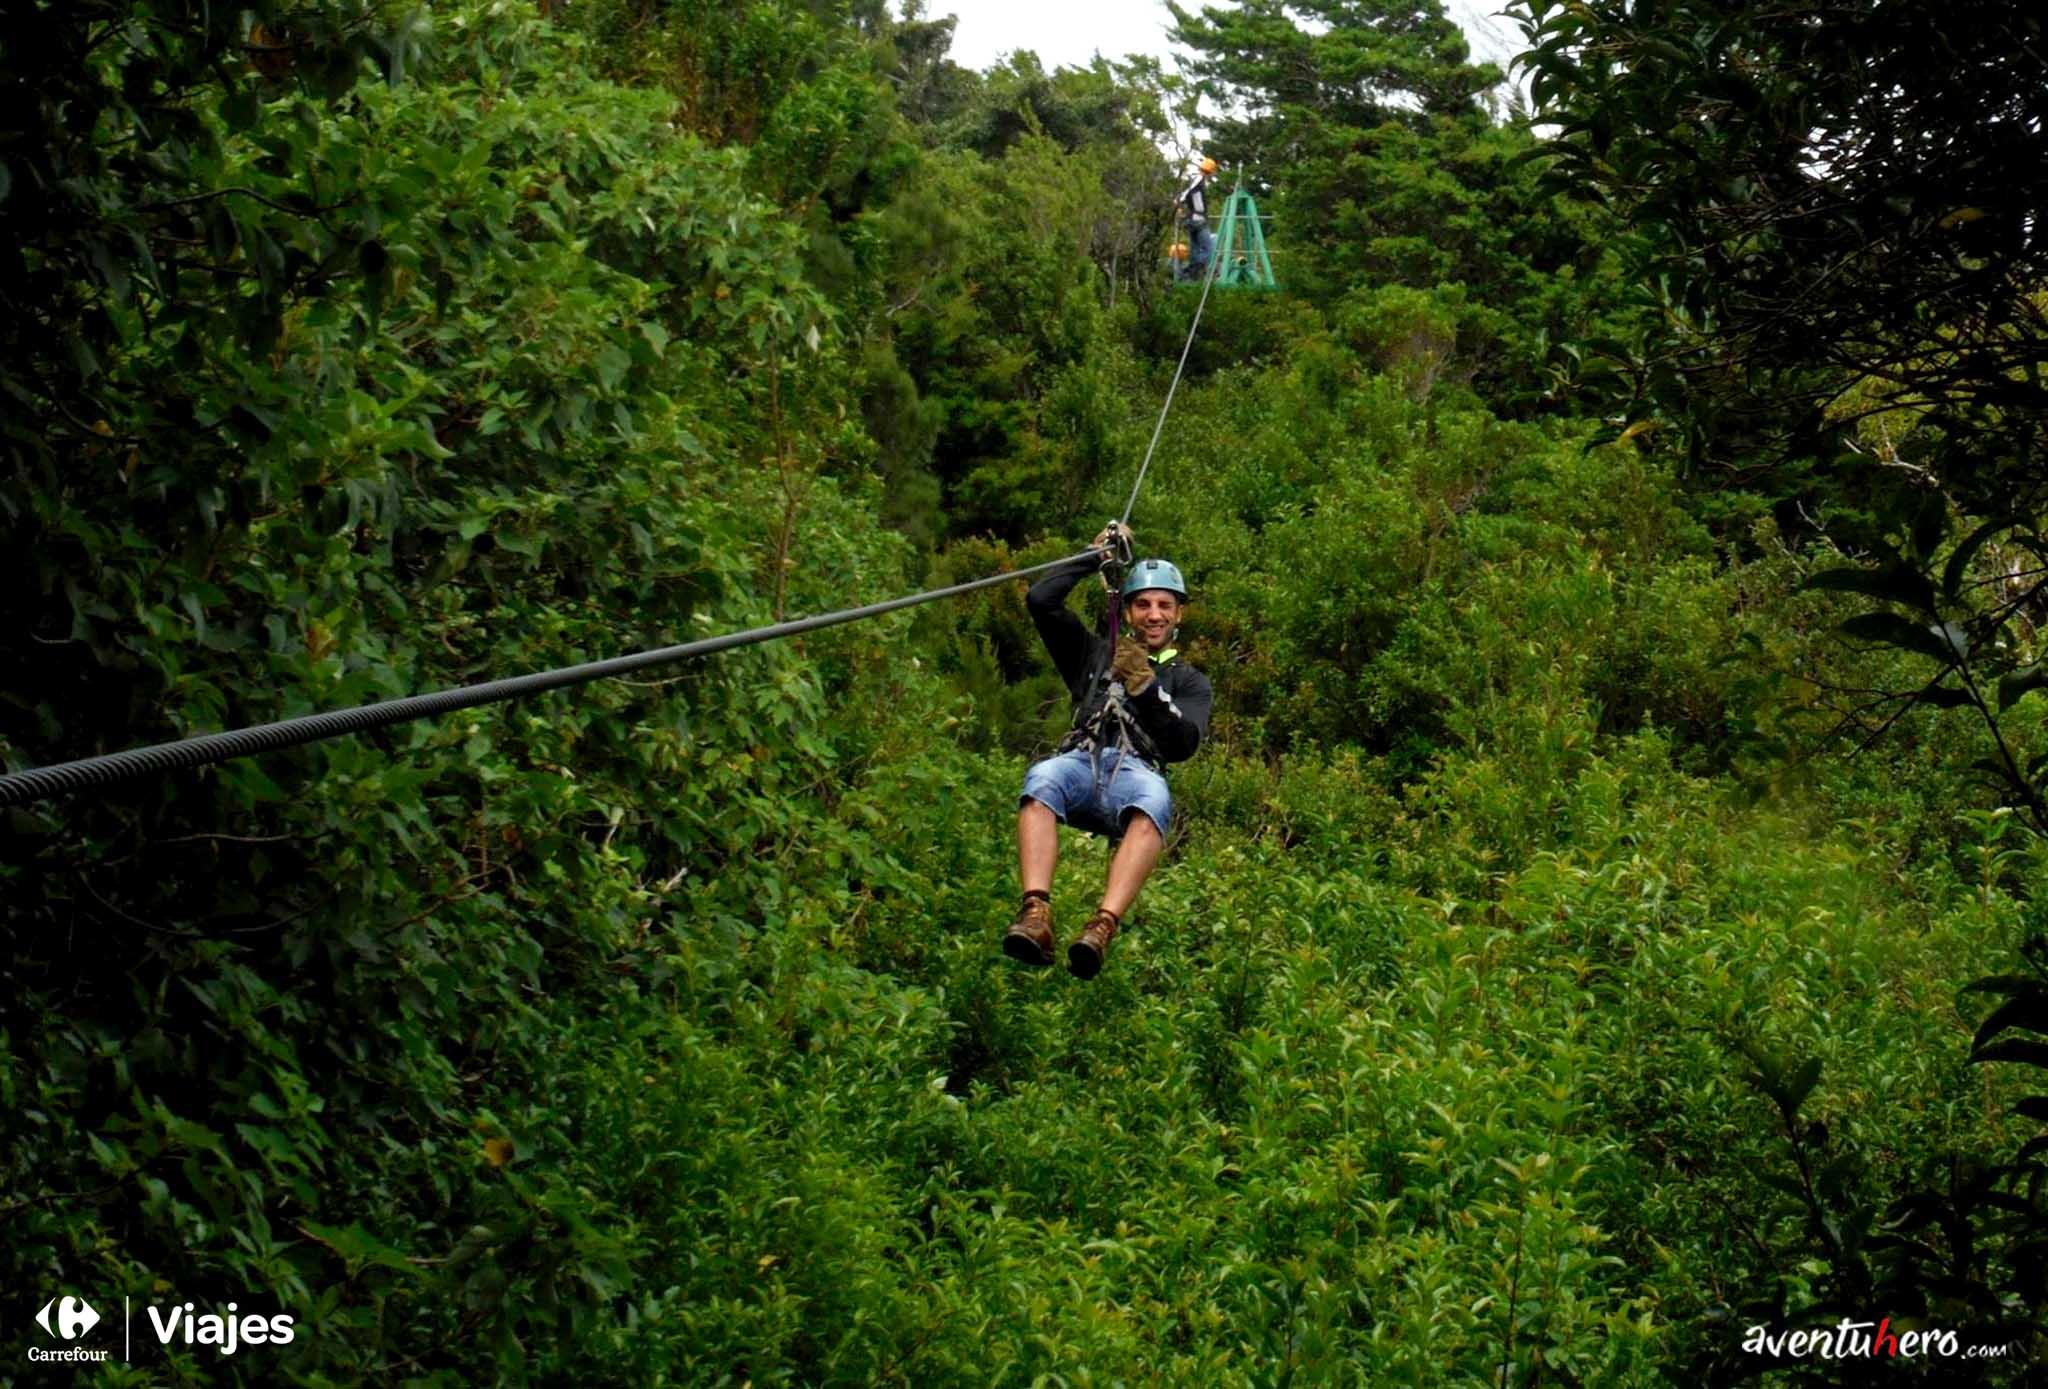 Costa Rica - Tirolinas en Monteverde